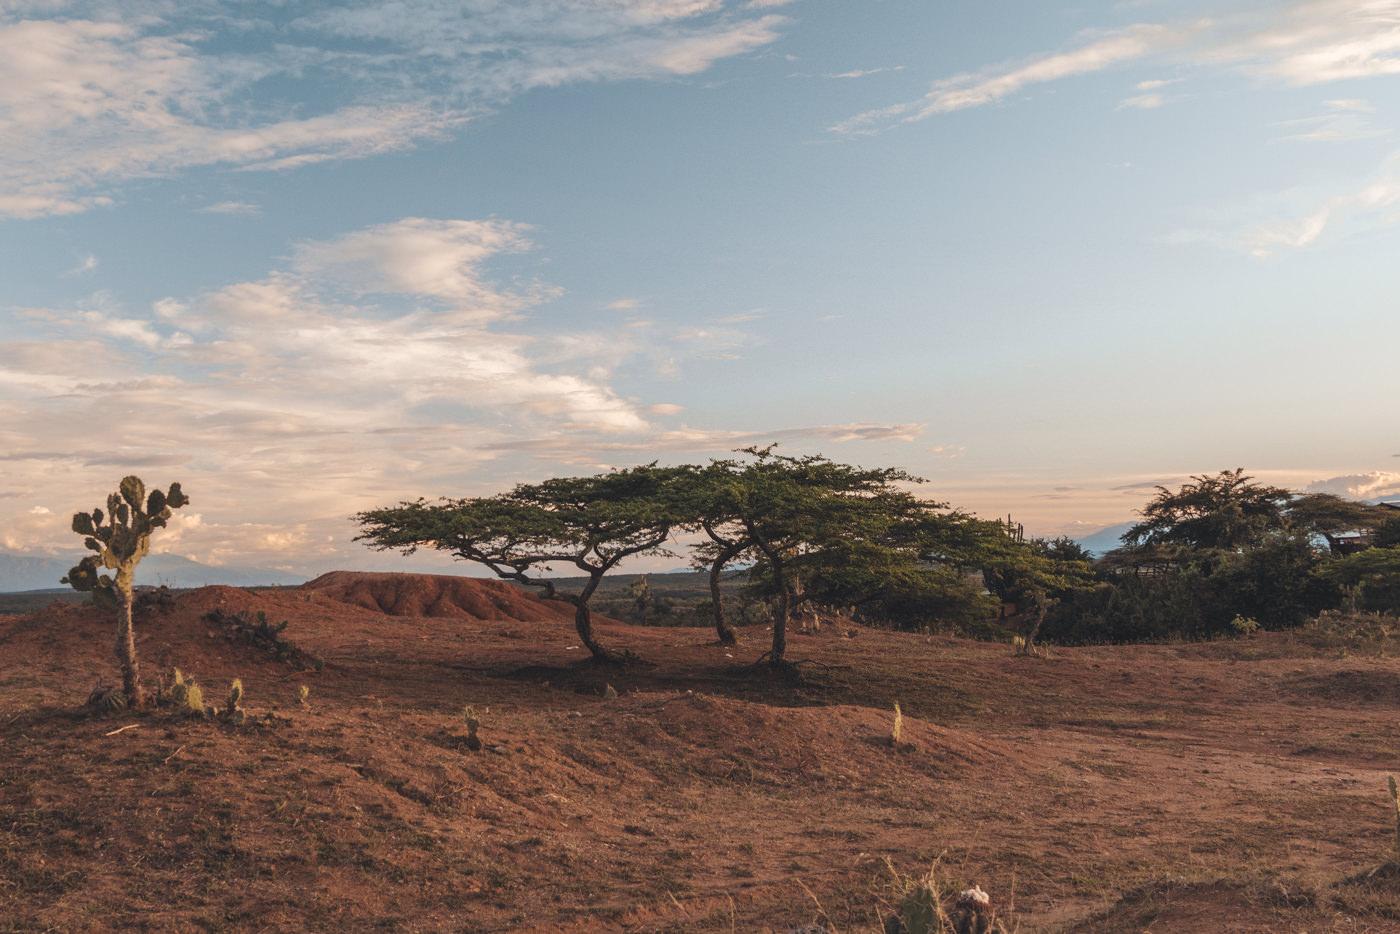 Die Landschaft der Tatacoa Wüste in Kolumbien